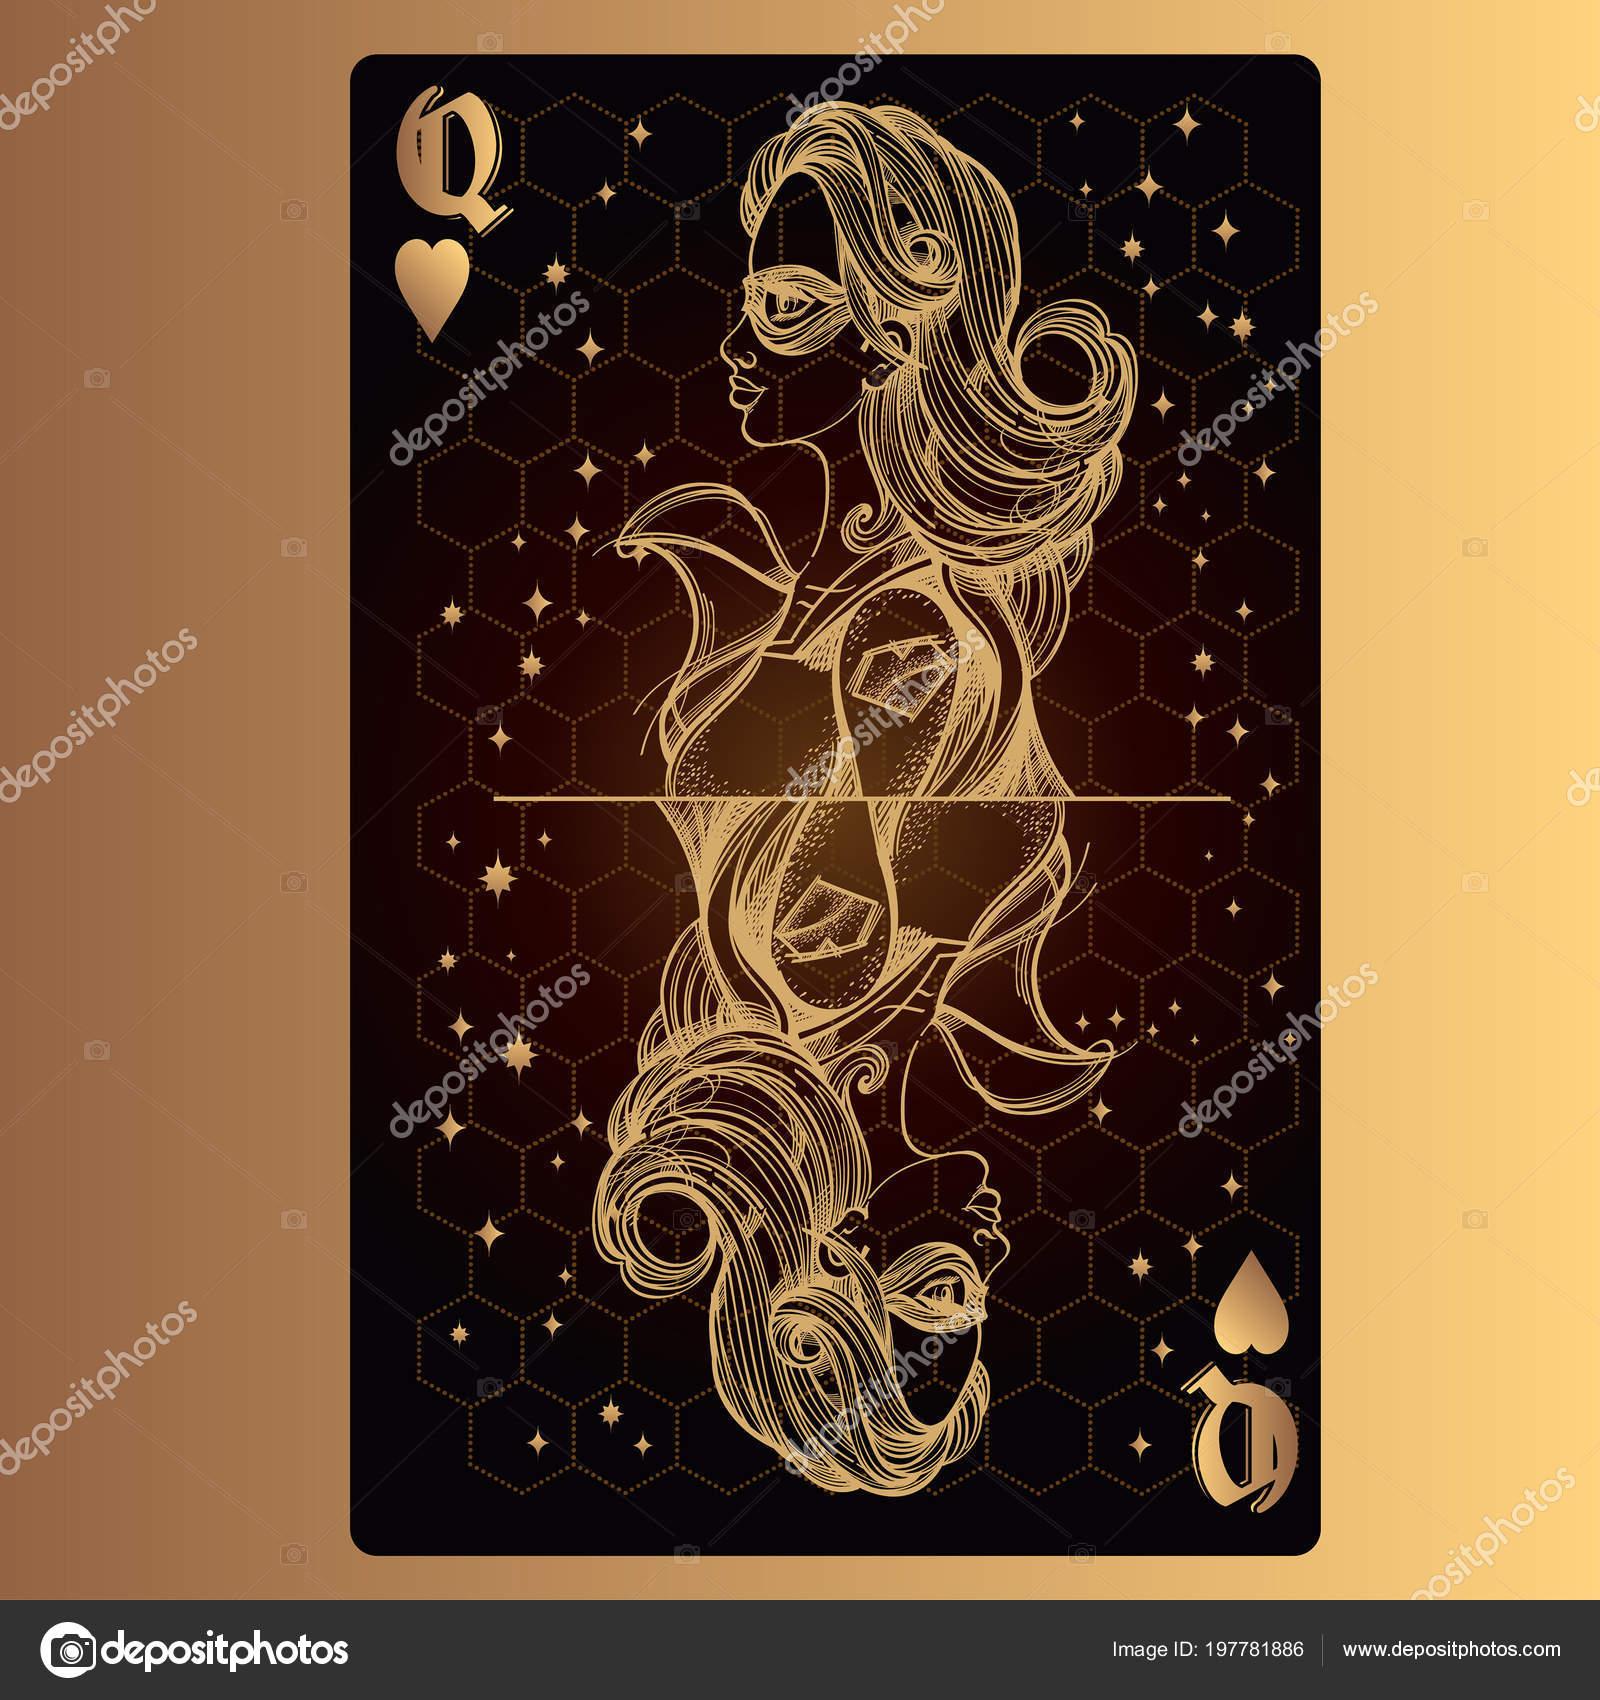 Queen Hearts Playing Card Original Design Theme Space Stock Vector